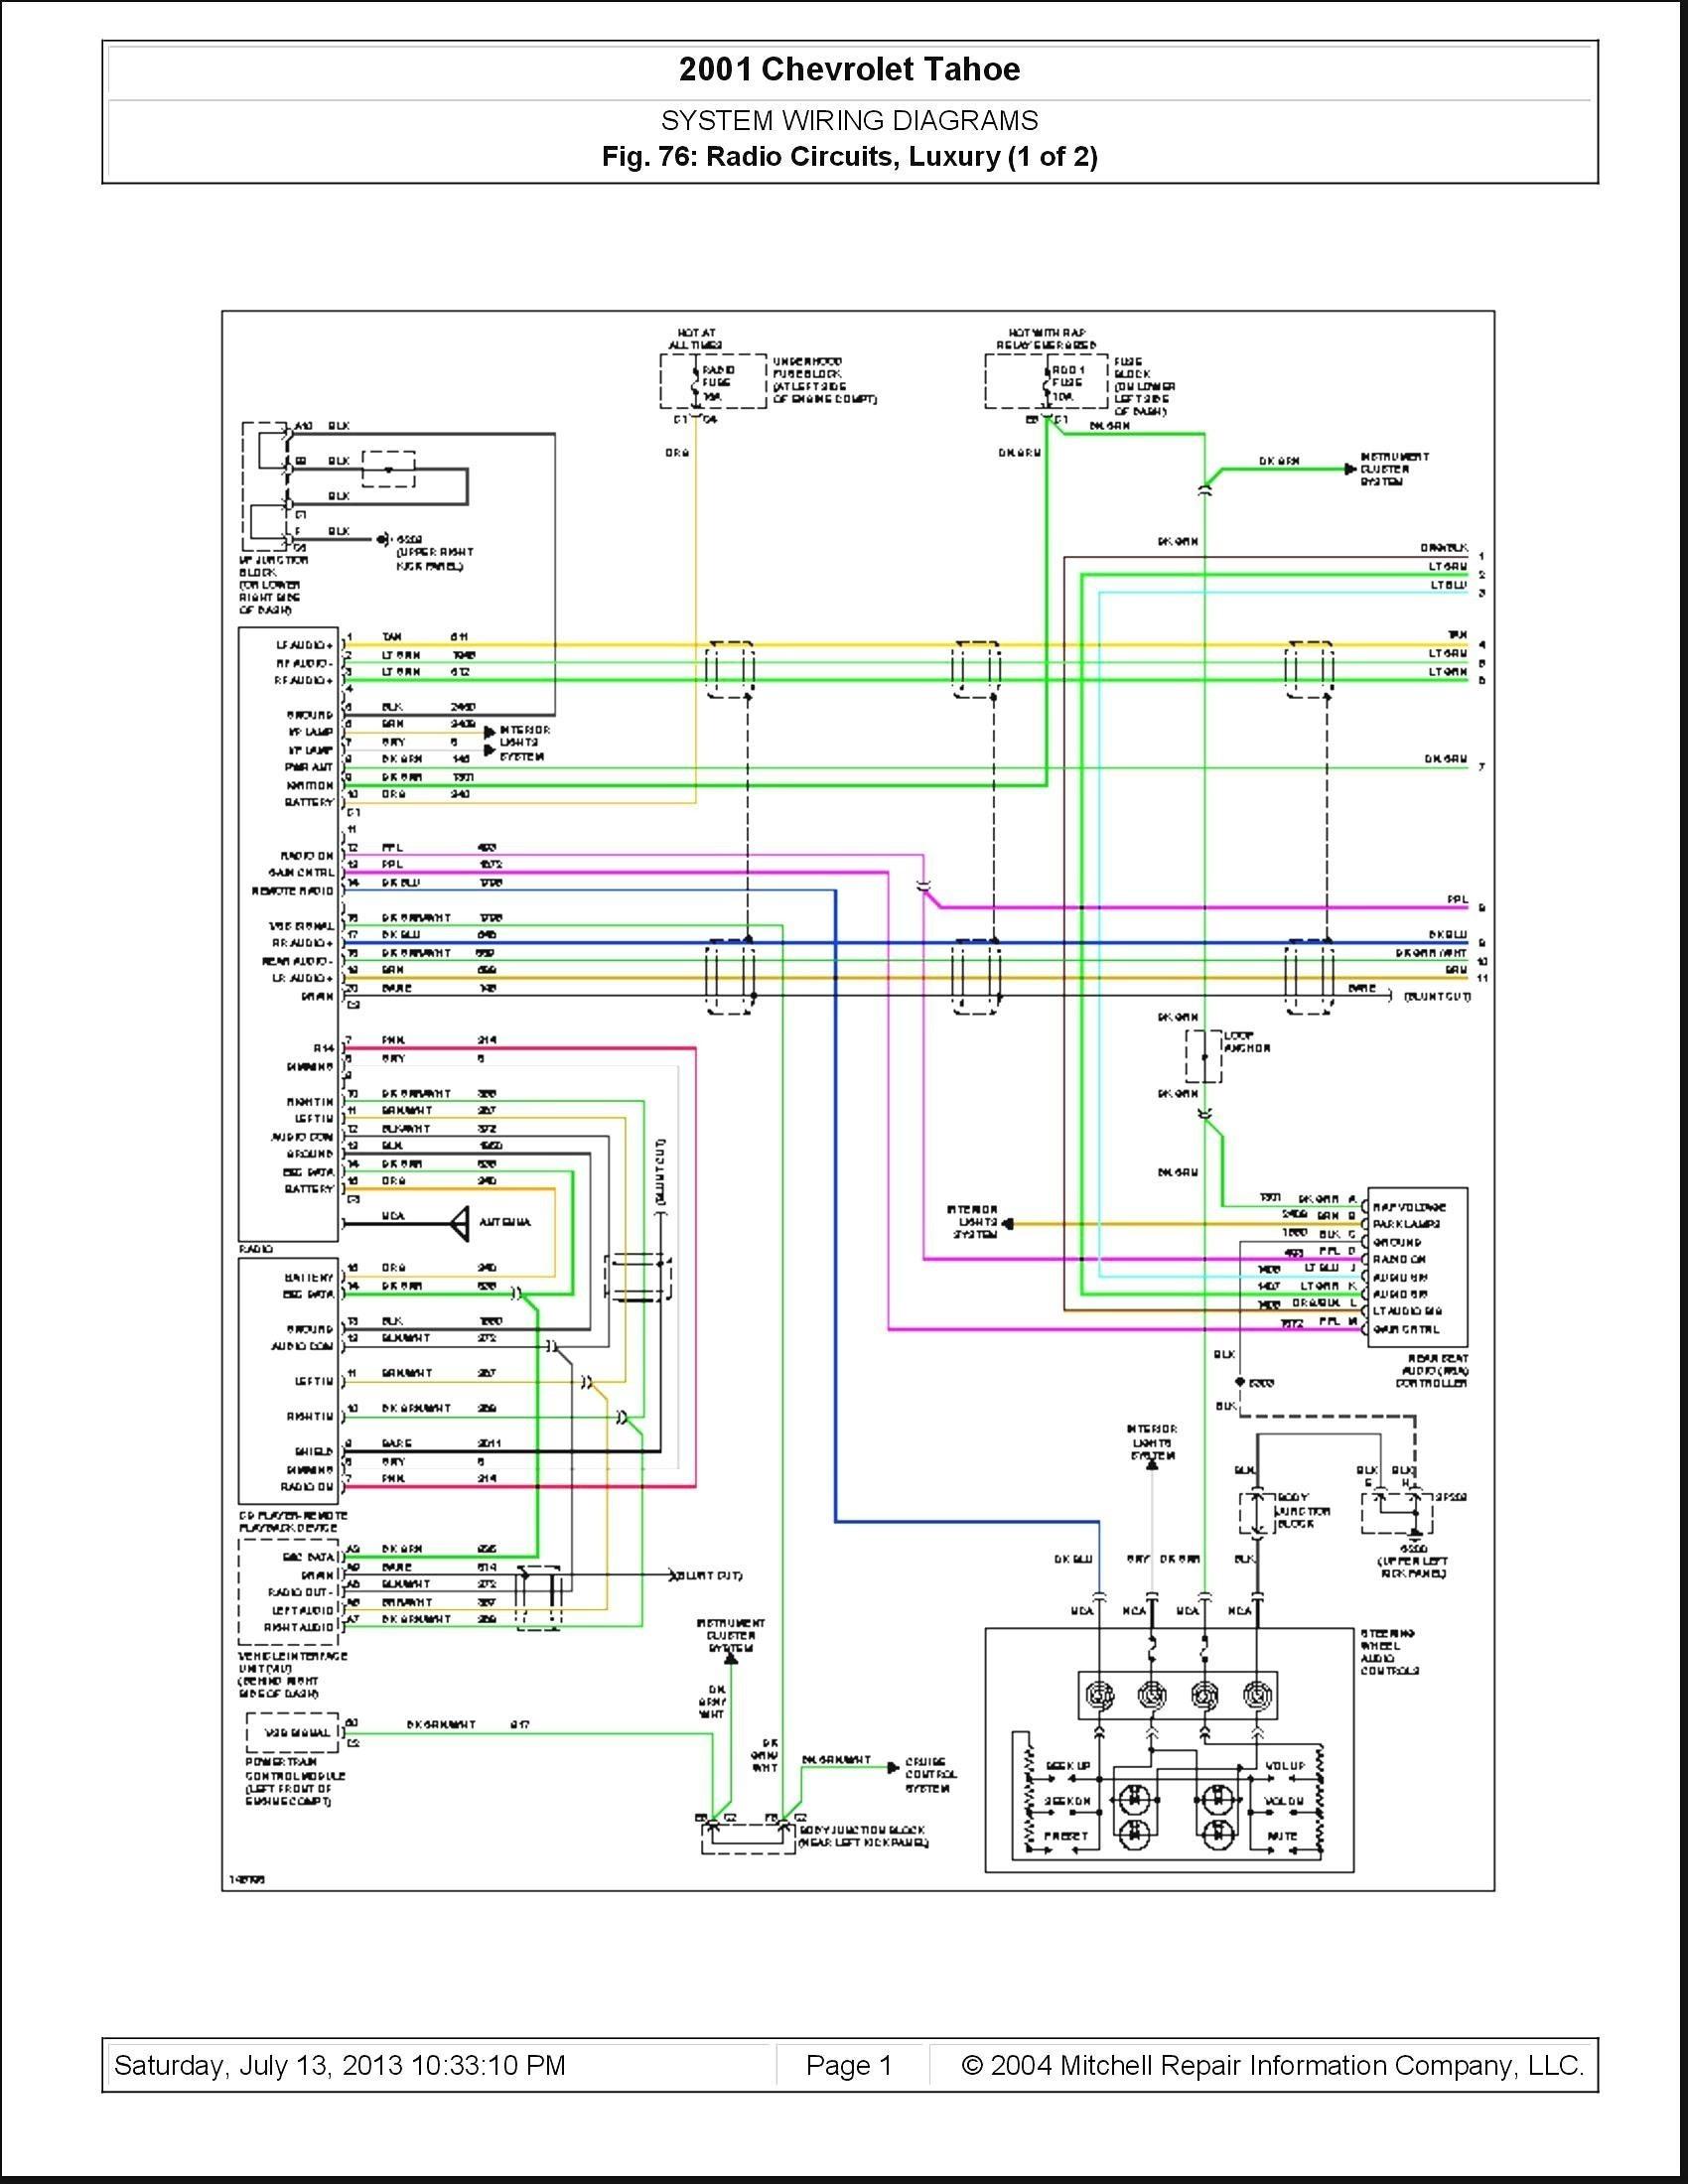 Wiring Diagram For Kia Sportage - Wiring Diagrams Schematic Asnières Espaces Verts